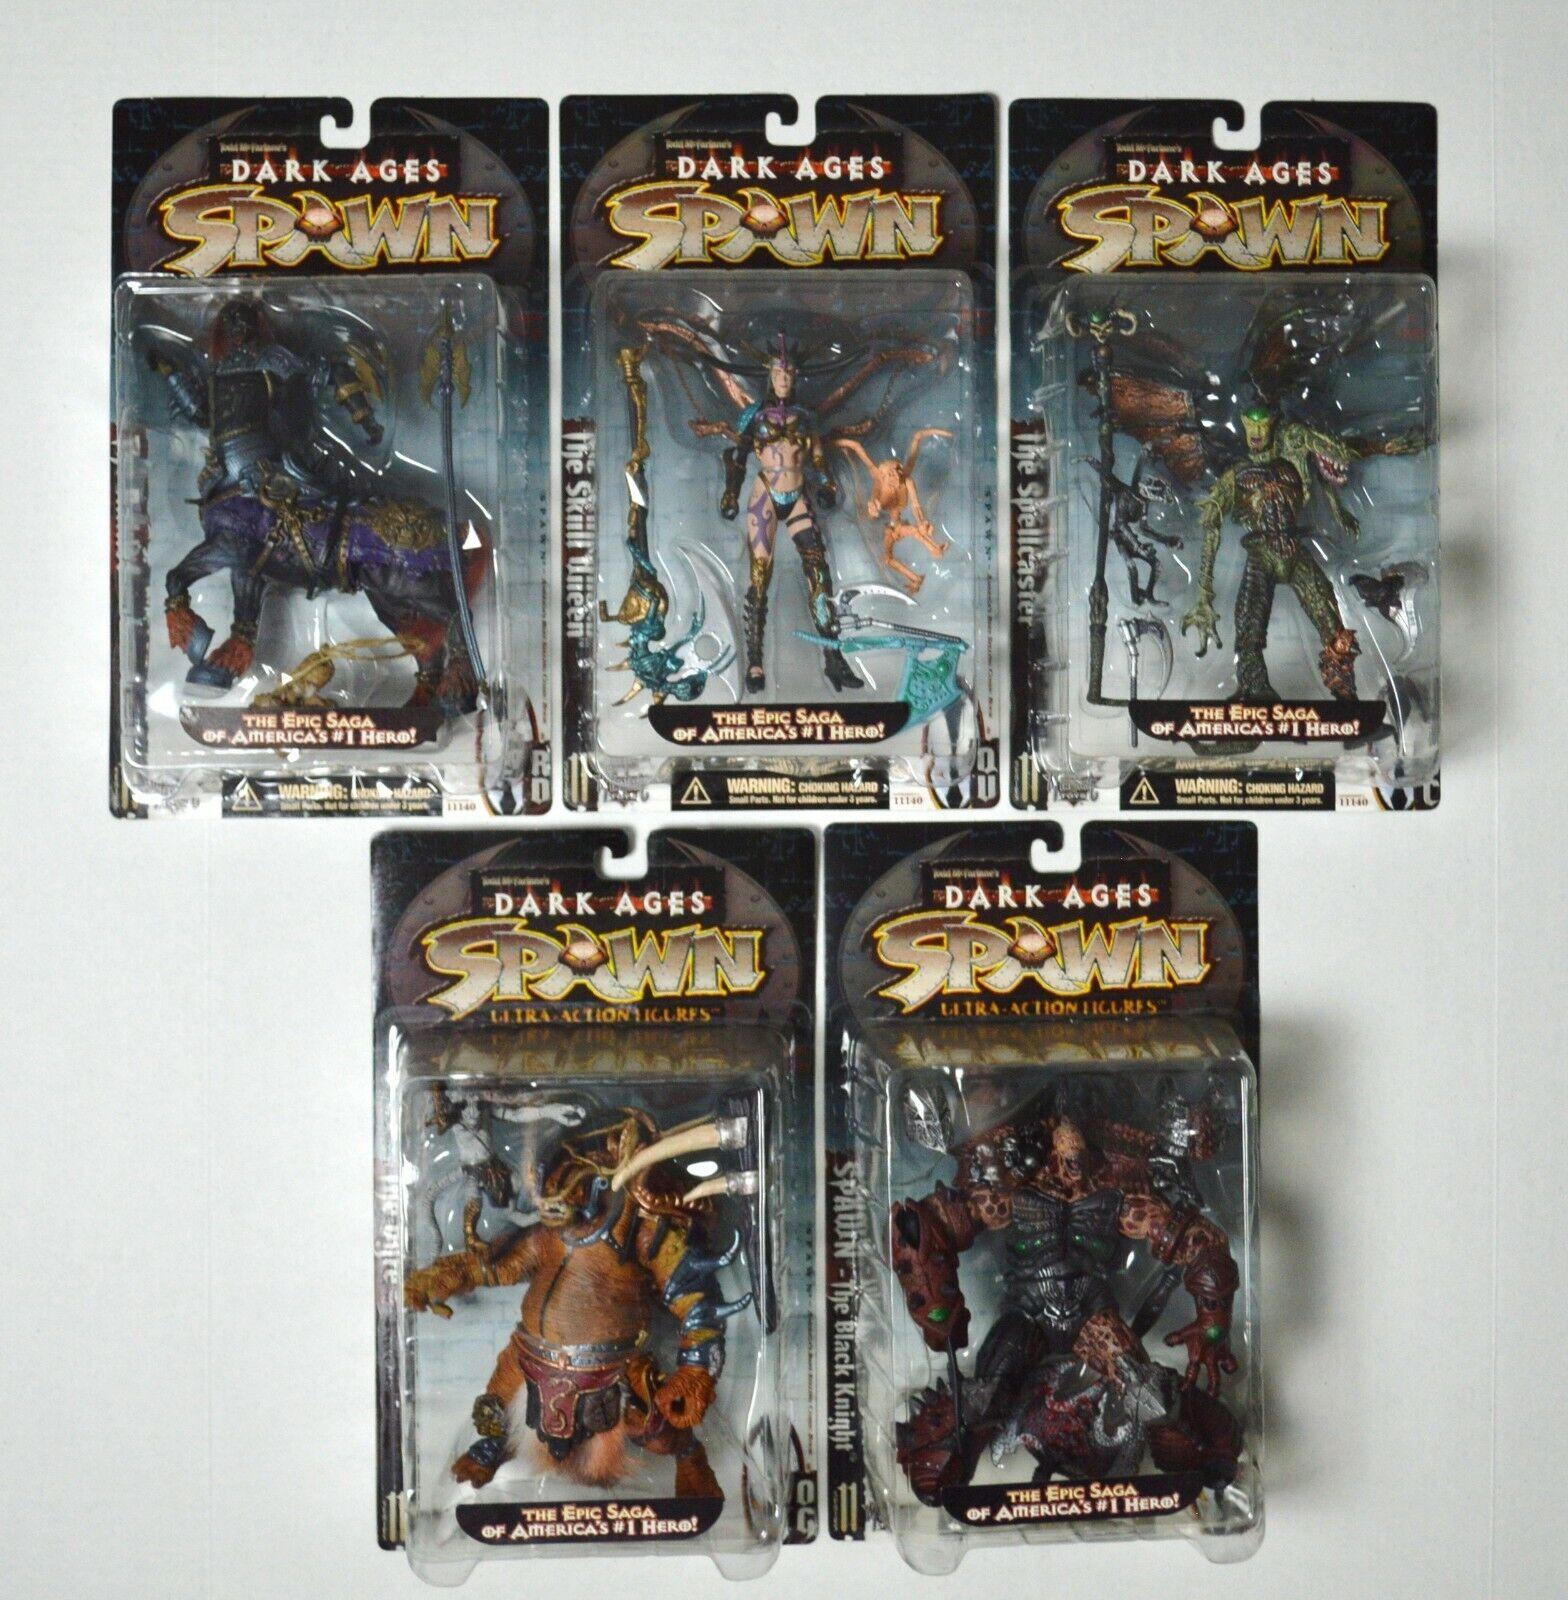 DARK AGES SPAWN -RARE 1996 Gothic Series McFarlane Toys Toys Toys Action Figure COLLECTION 08d5e1